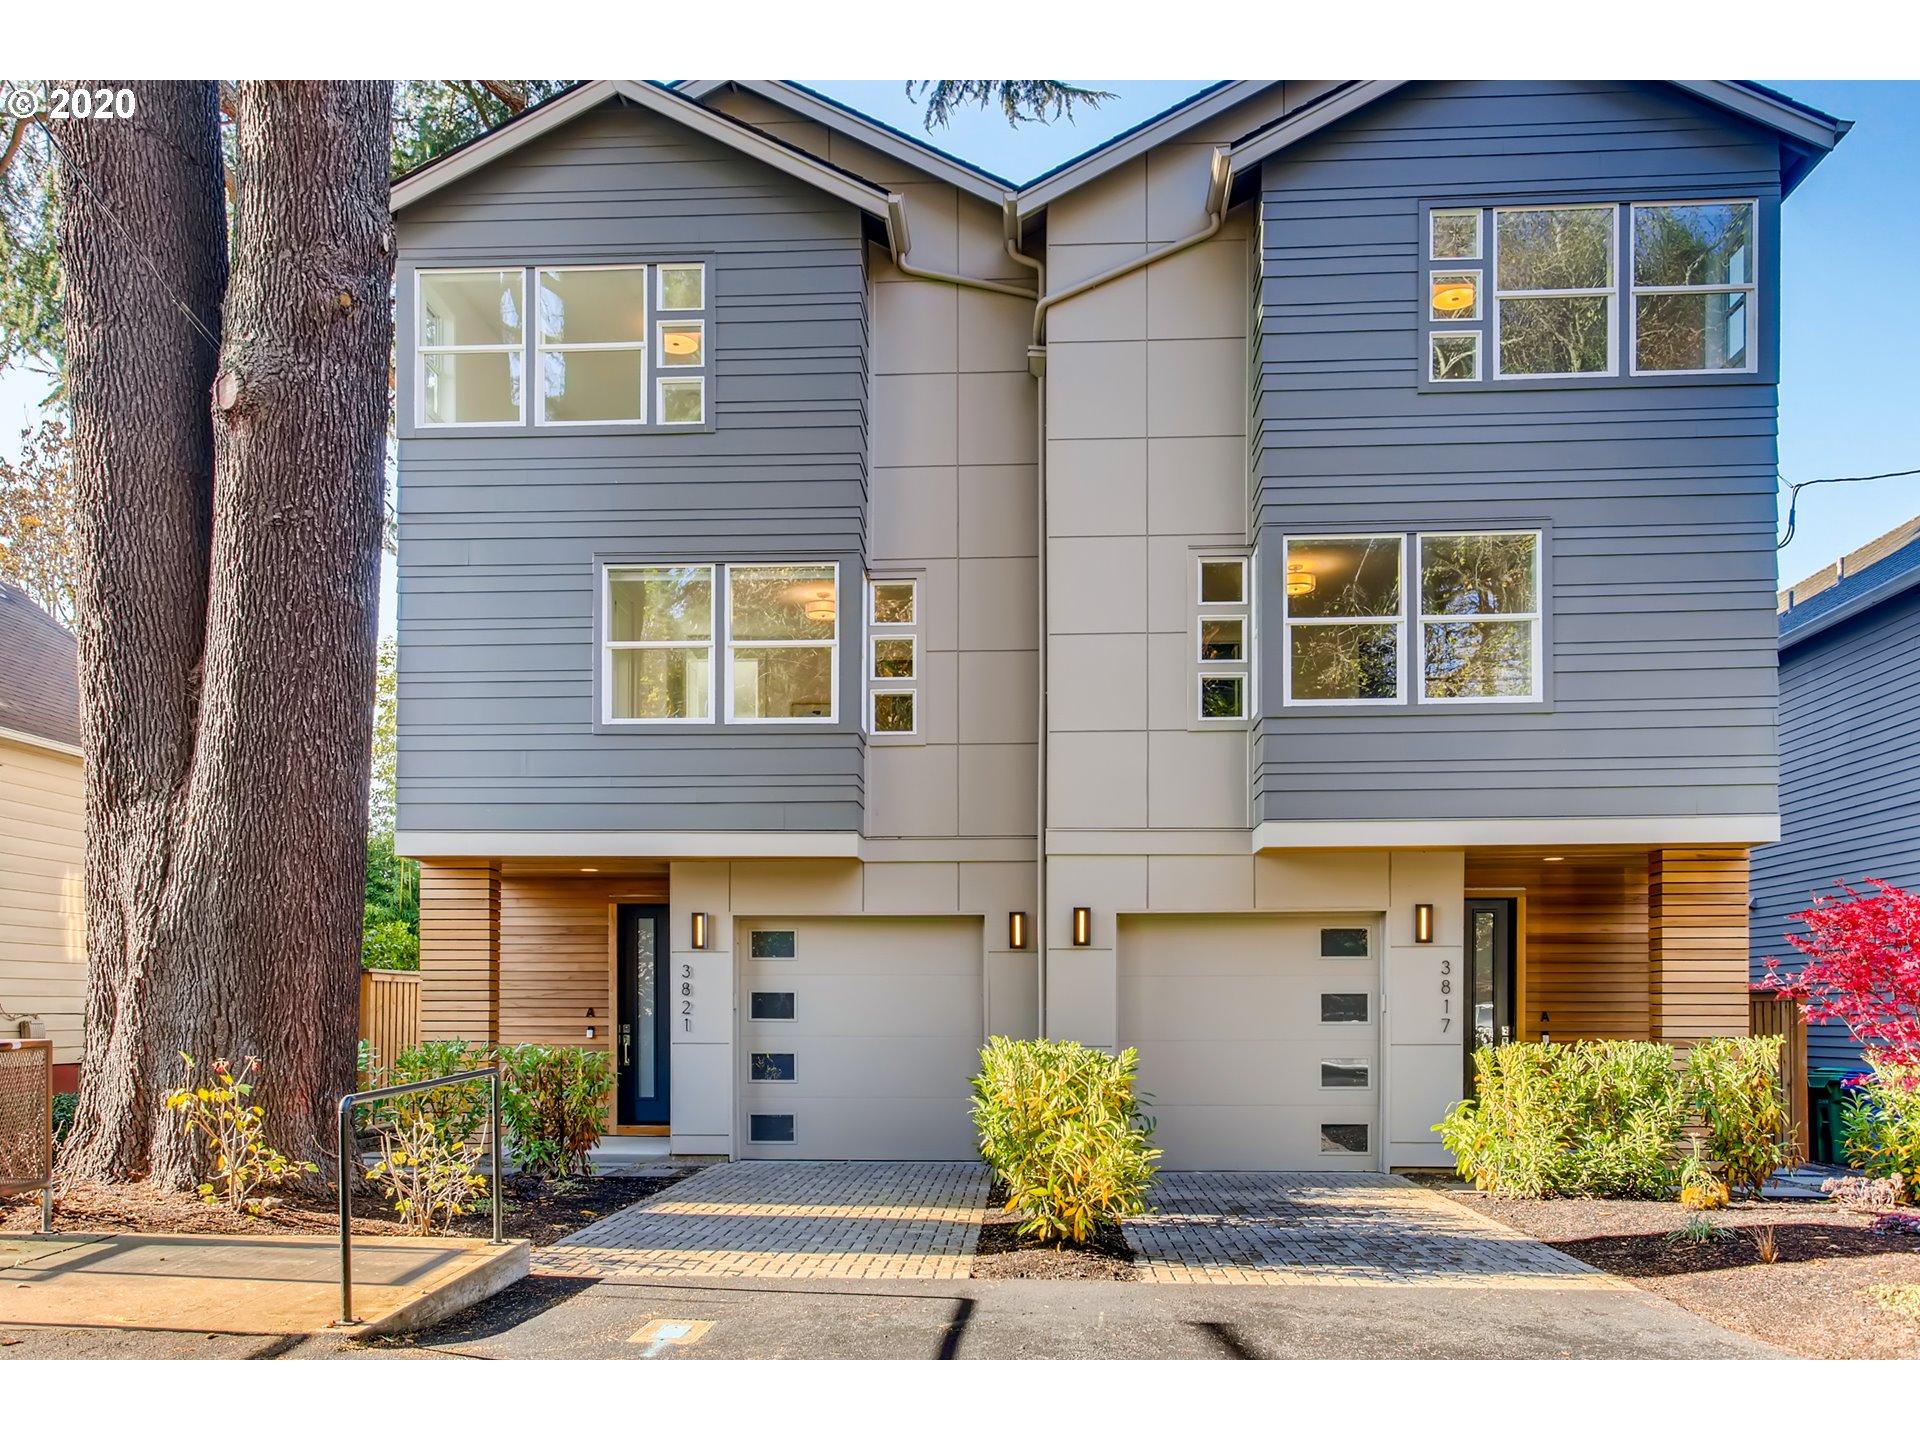 3821 SE 43rd AVE, Portland, OR 97206